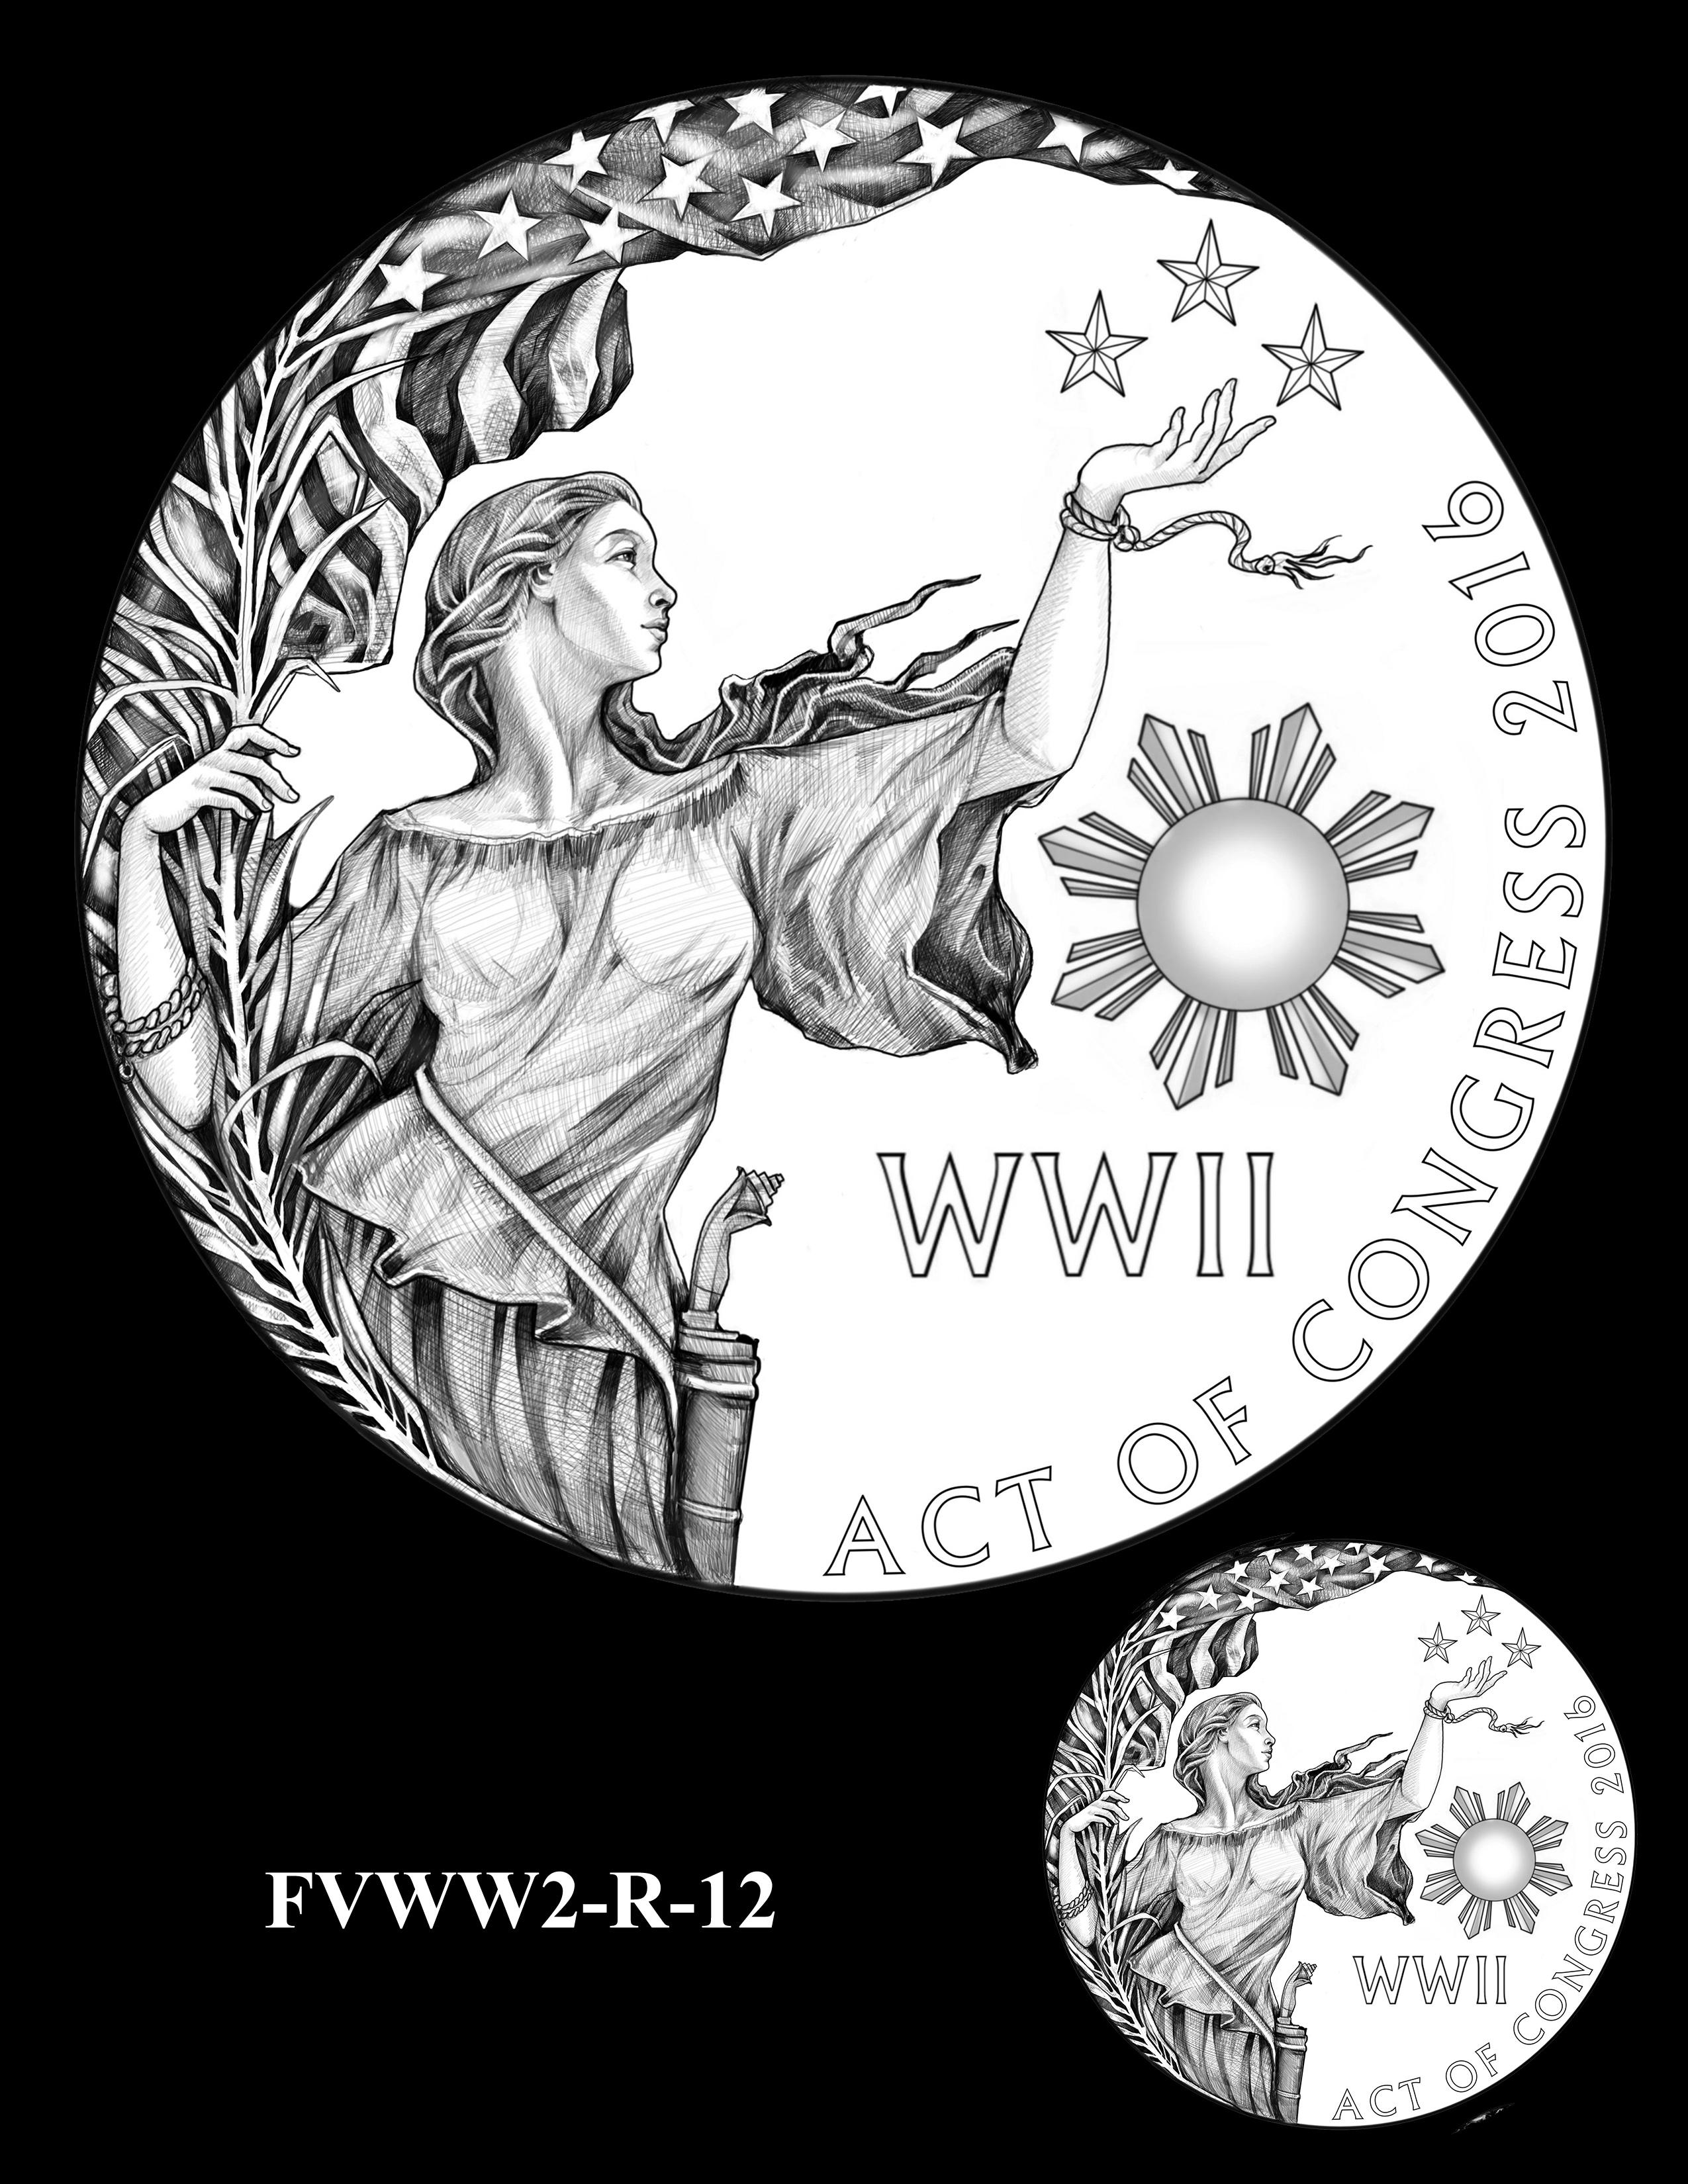 FVWW2-R-12 -- Filipino Veterans of World War II Congressional Gold Medal